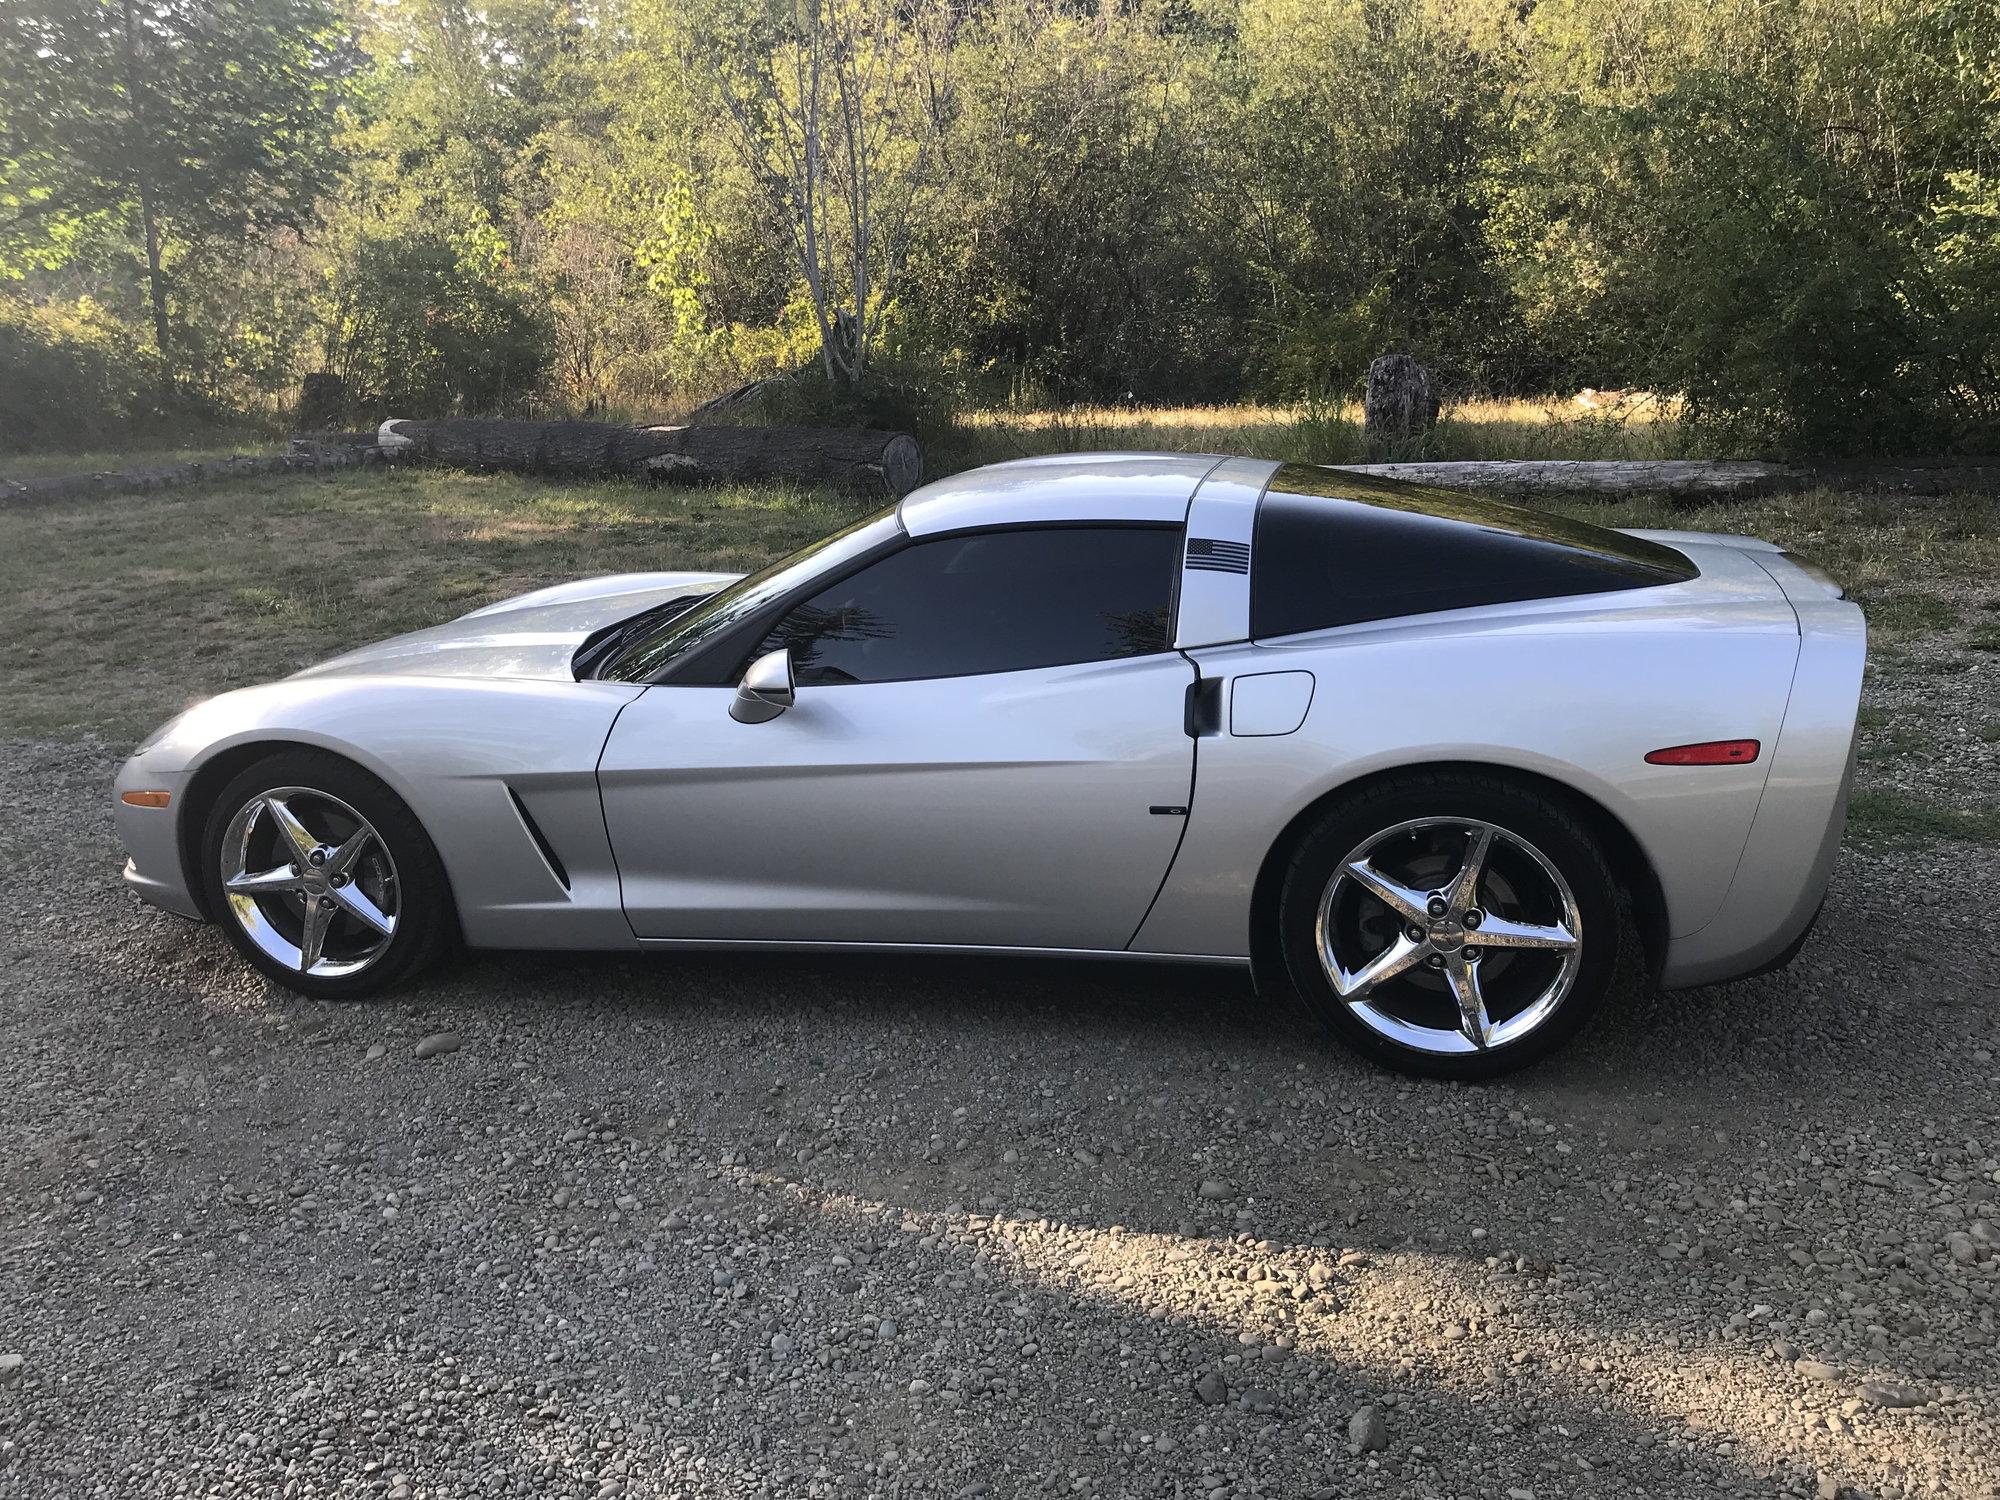 FS/2000 Corvette Supercharged 383 - CorvetteForum